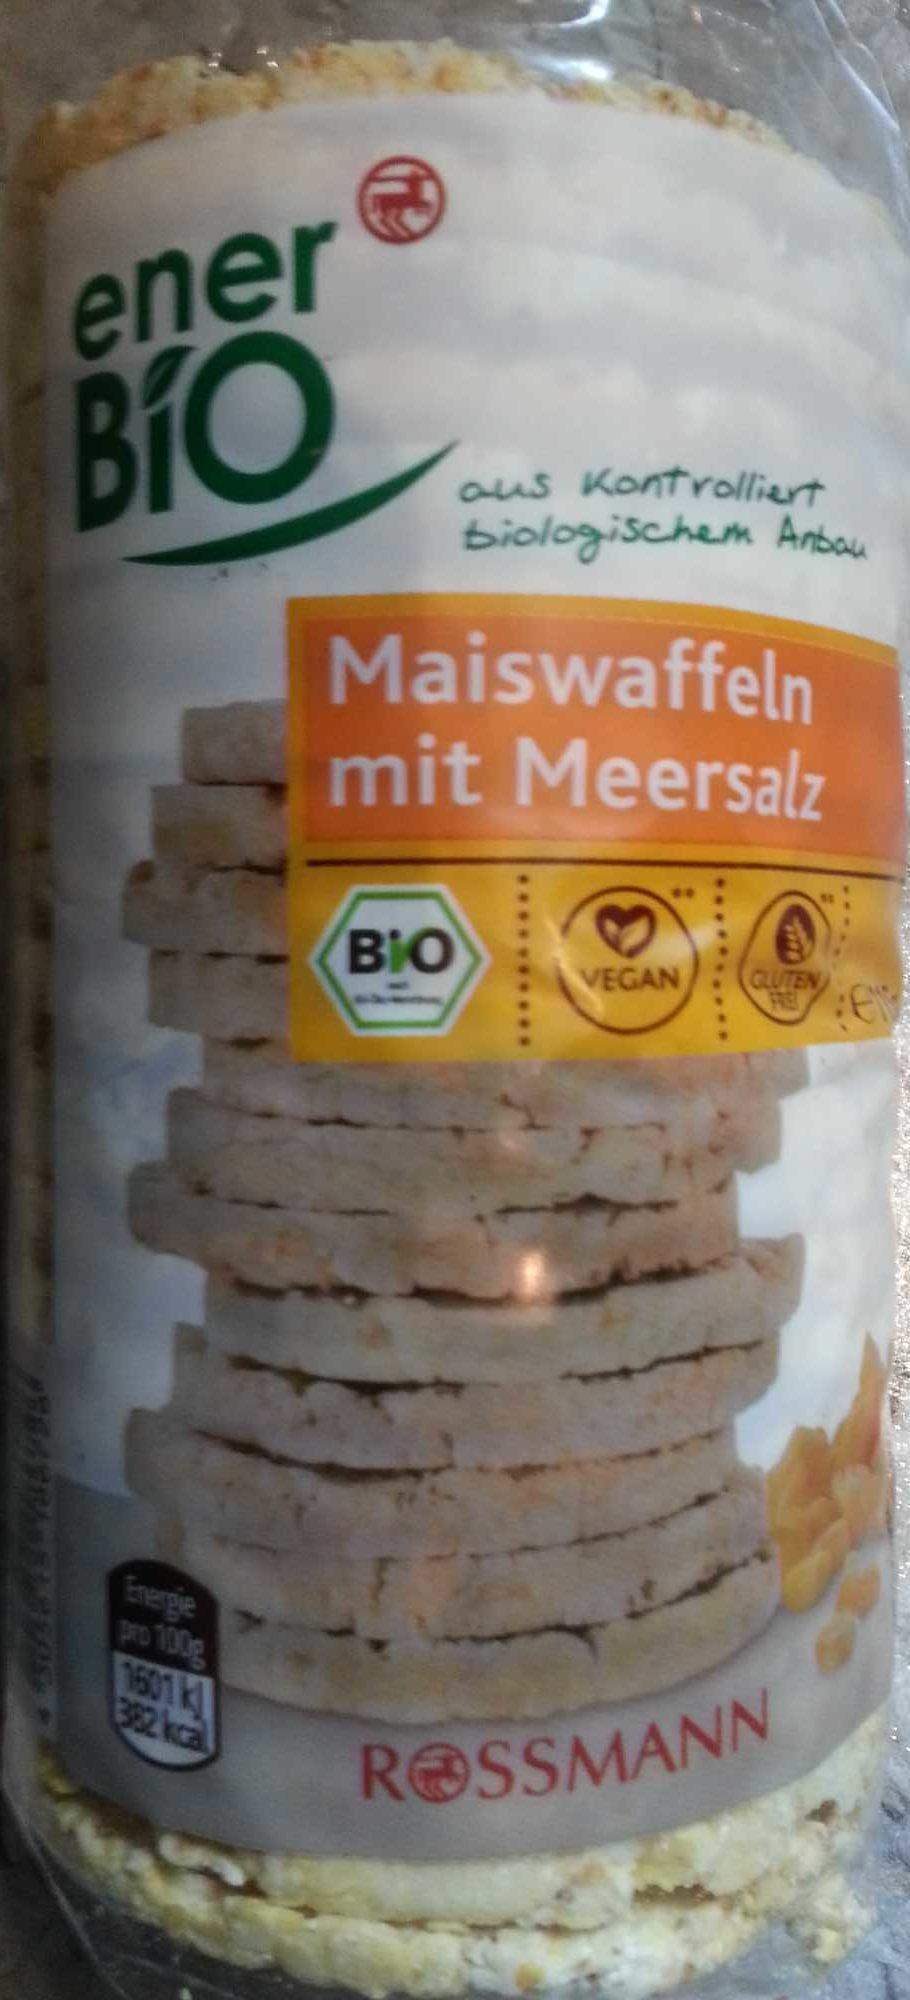 Maiswaffeln mit Meersalz - Produit - de